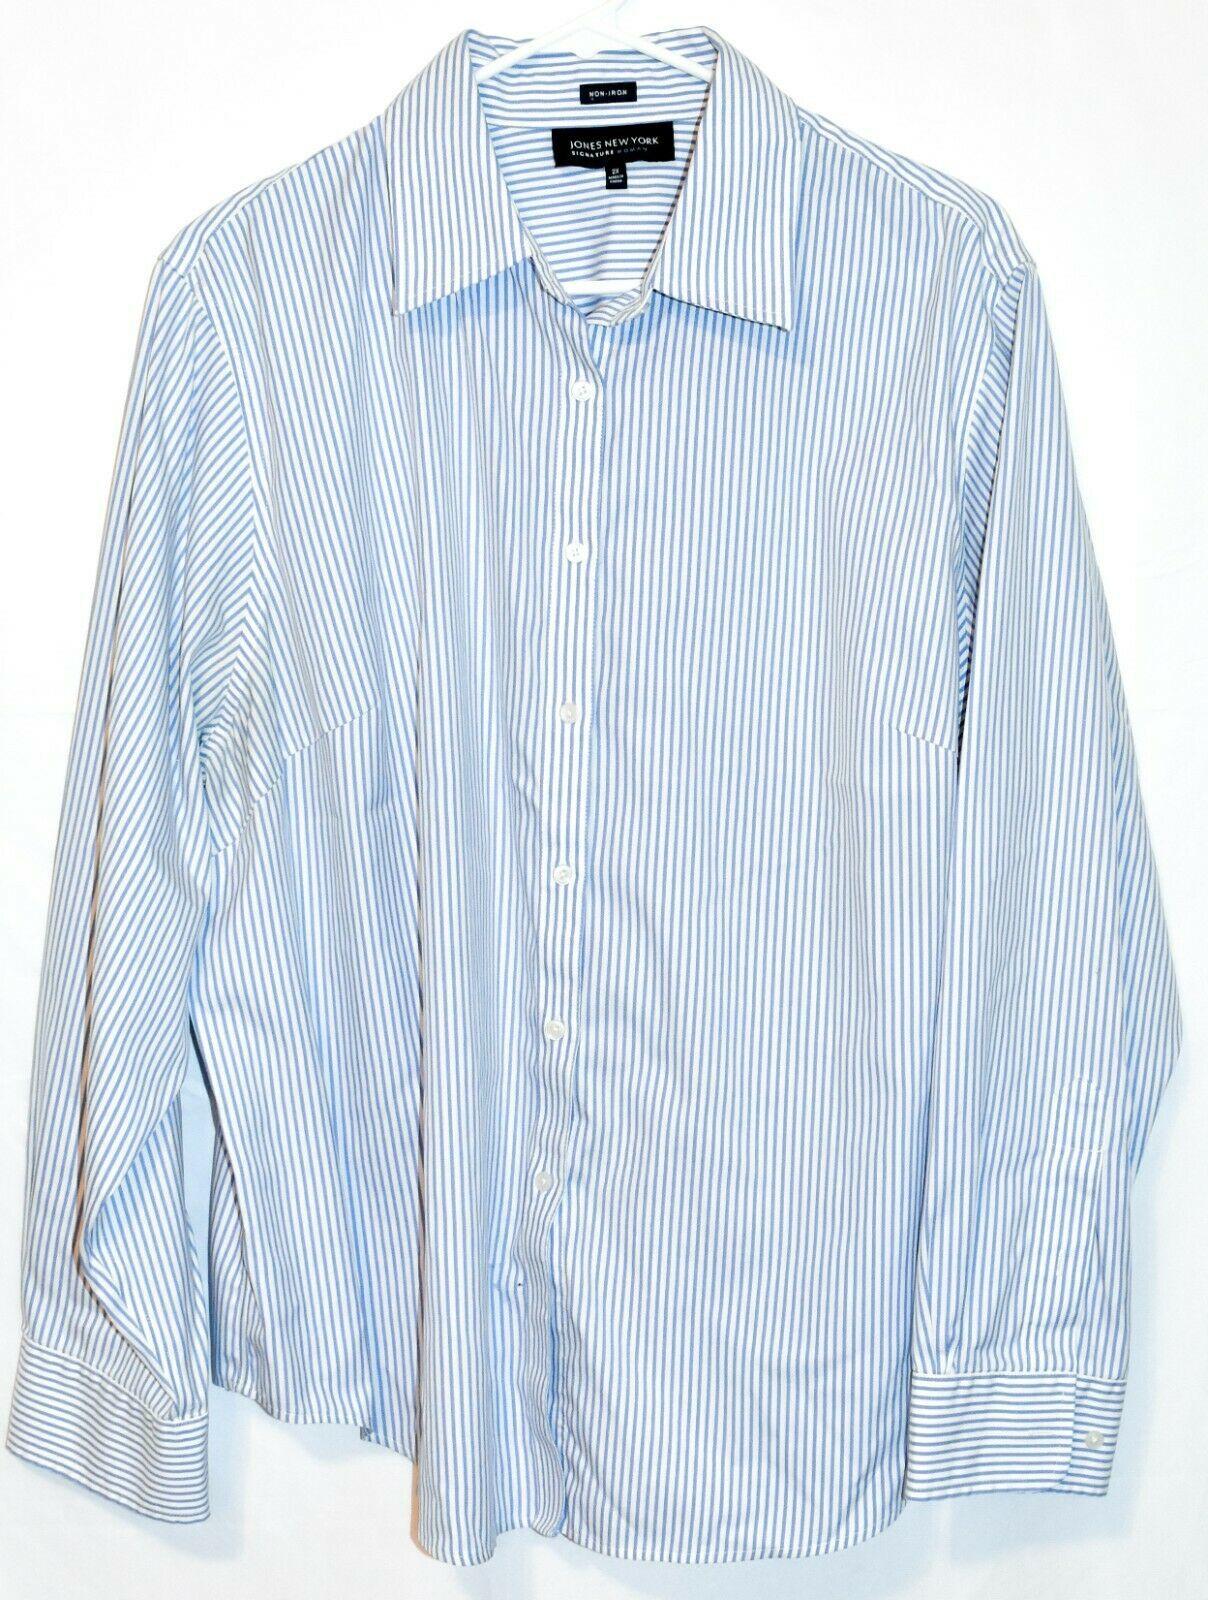 Jones New York Signature Woman Non Iron Blue & White Pinstripe Button-Up Blouse